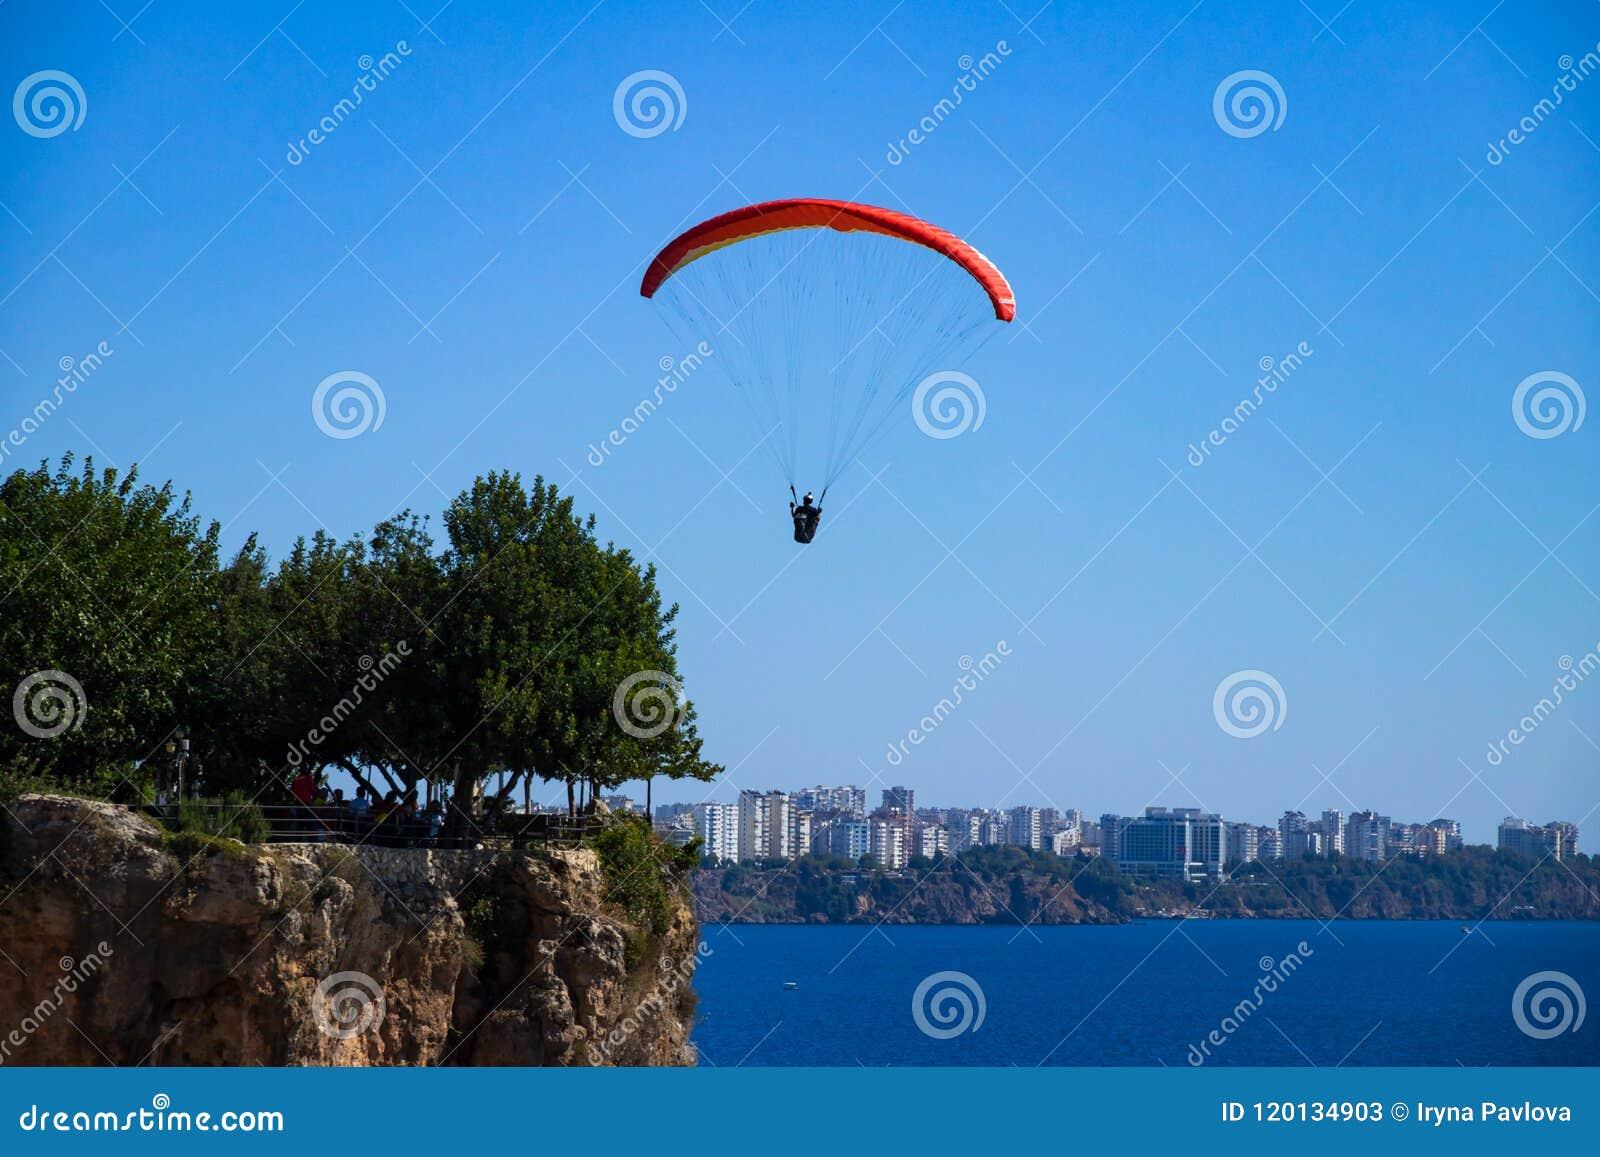 Человек летает на параплан